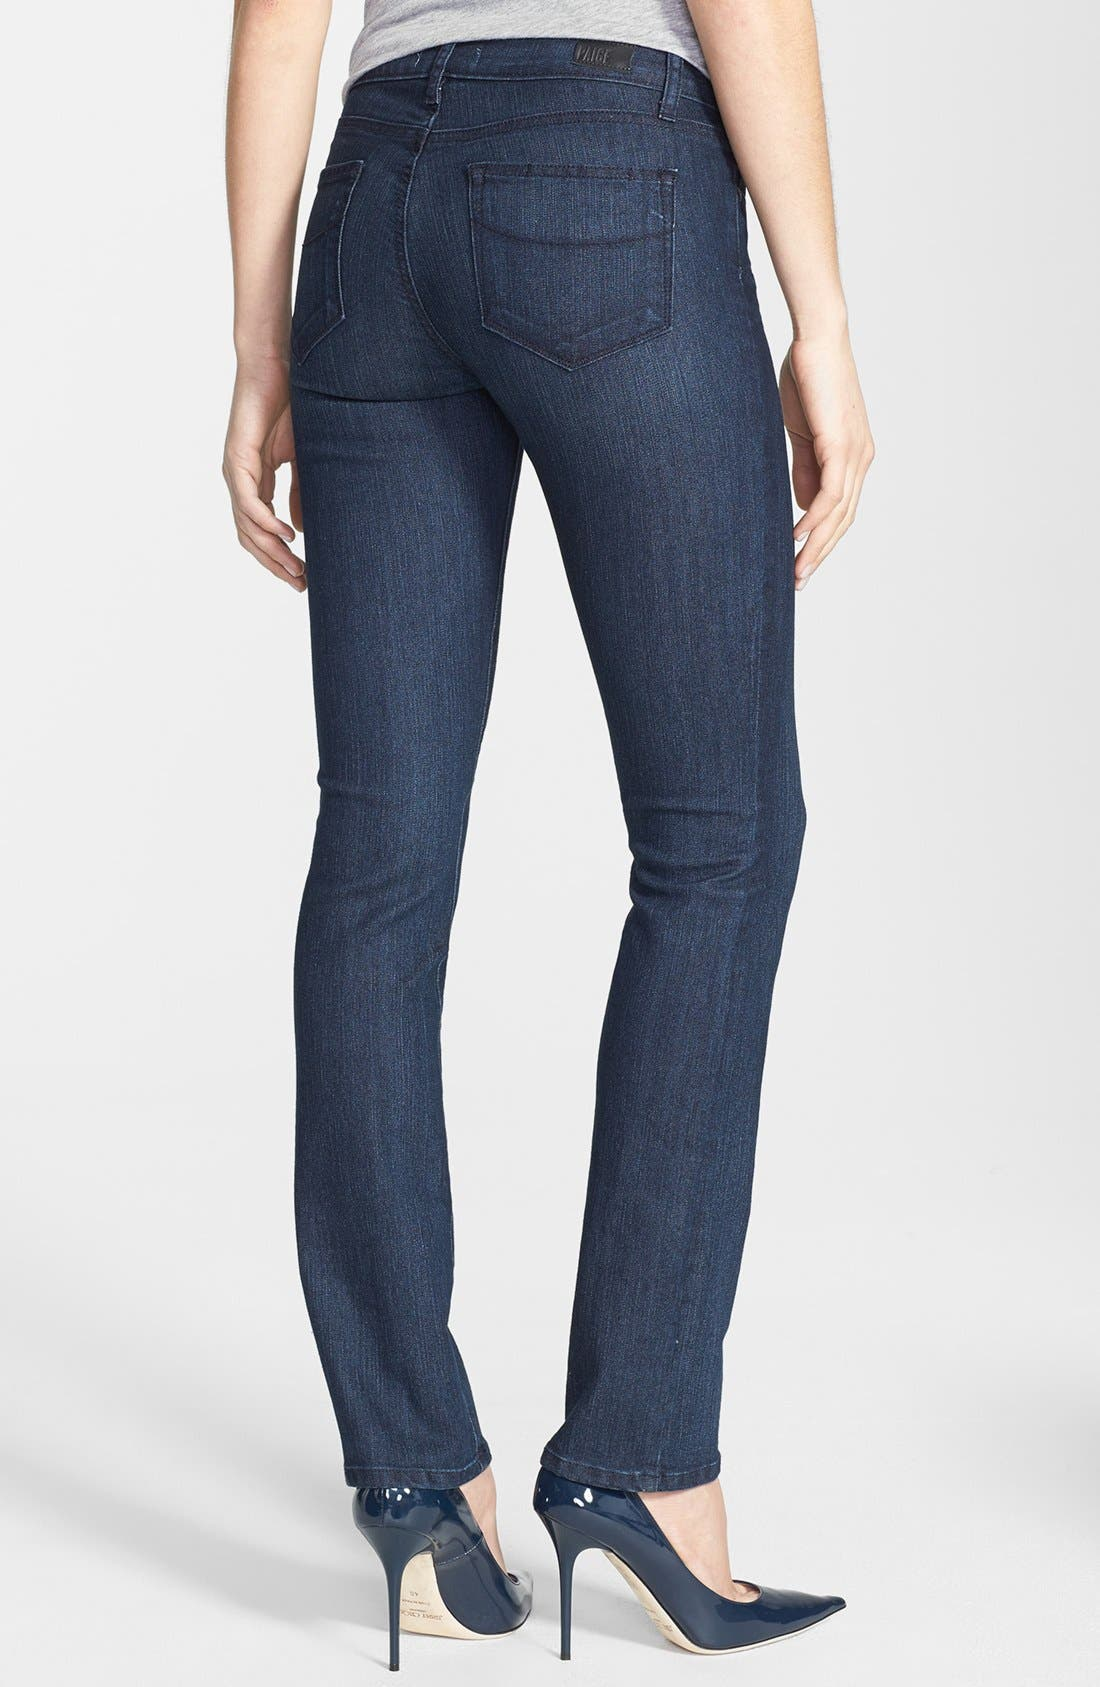 Alternate Image 2  - Paige Denim 'Skyline' Straight Leg Jeans (Manchester) (Petite)